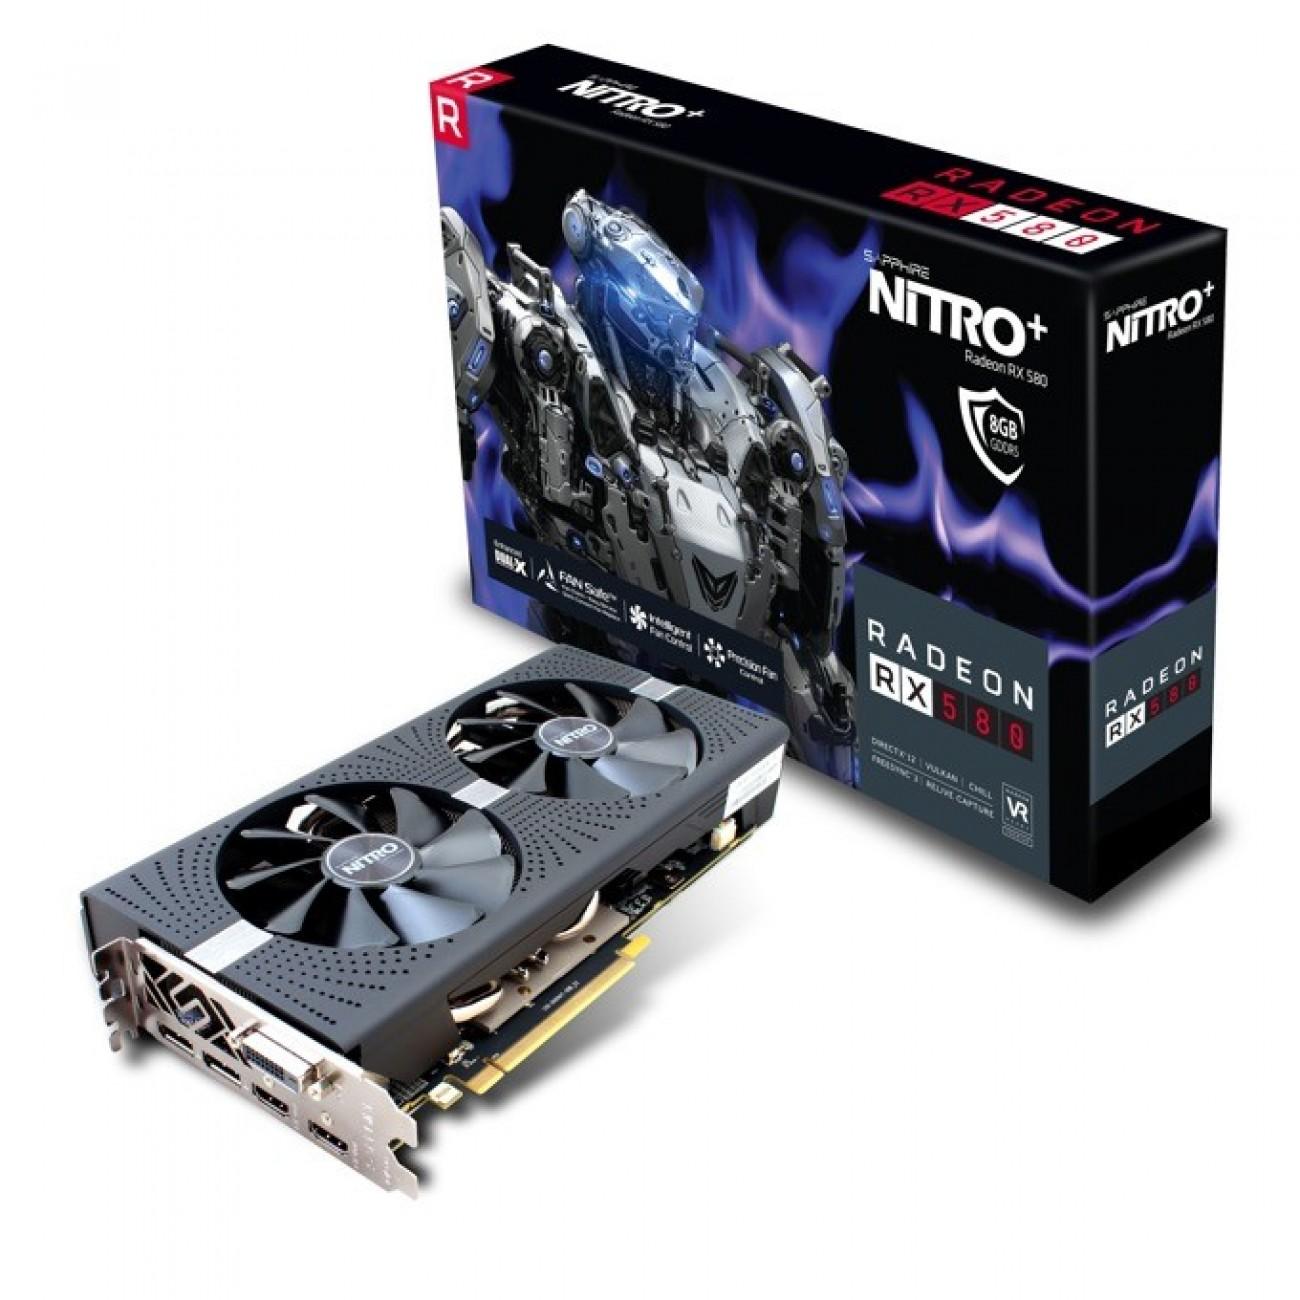 Видео карта AMD Radeon RX 580, 8GB, Sapphire NITRO+ Radeon RX 580 4GD5, PCI-E 3.0, GDDR5, 256 bit, 2x Display Port, 1x HDMI, 1x DVI в Видео карти -  | Alleop